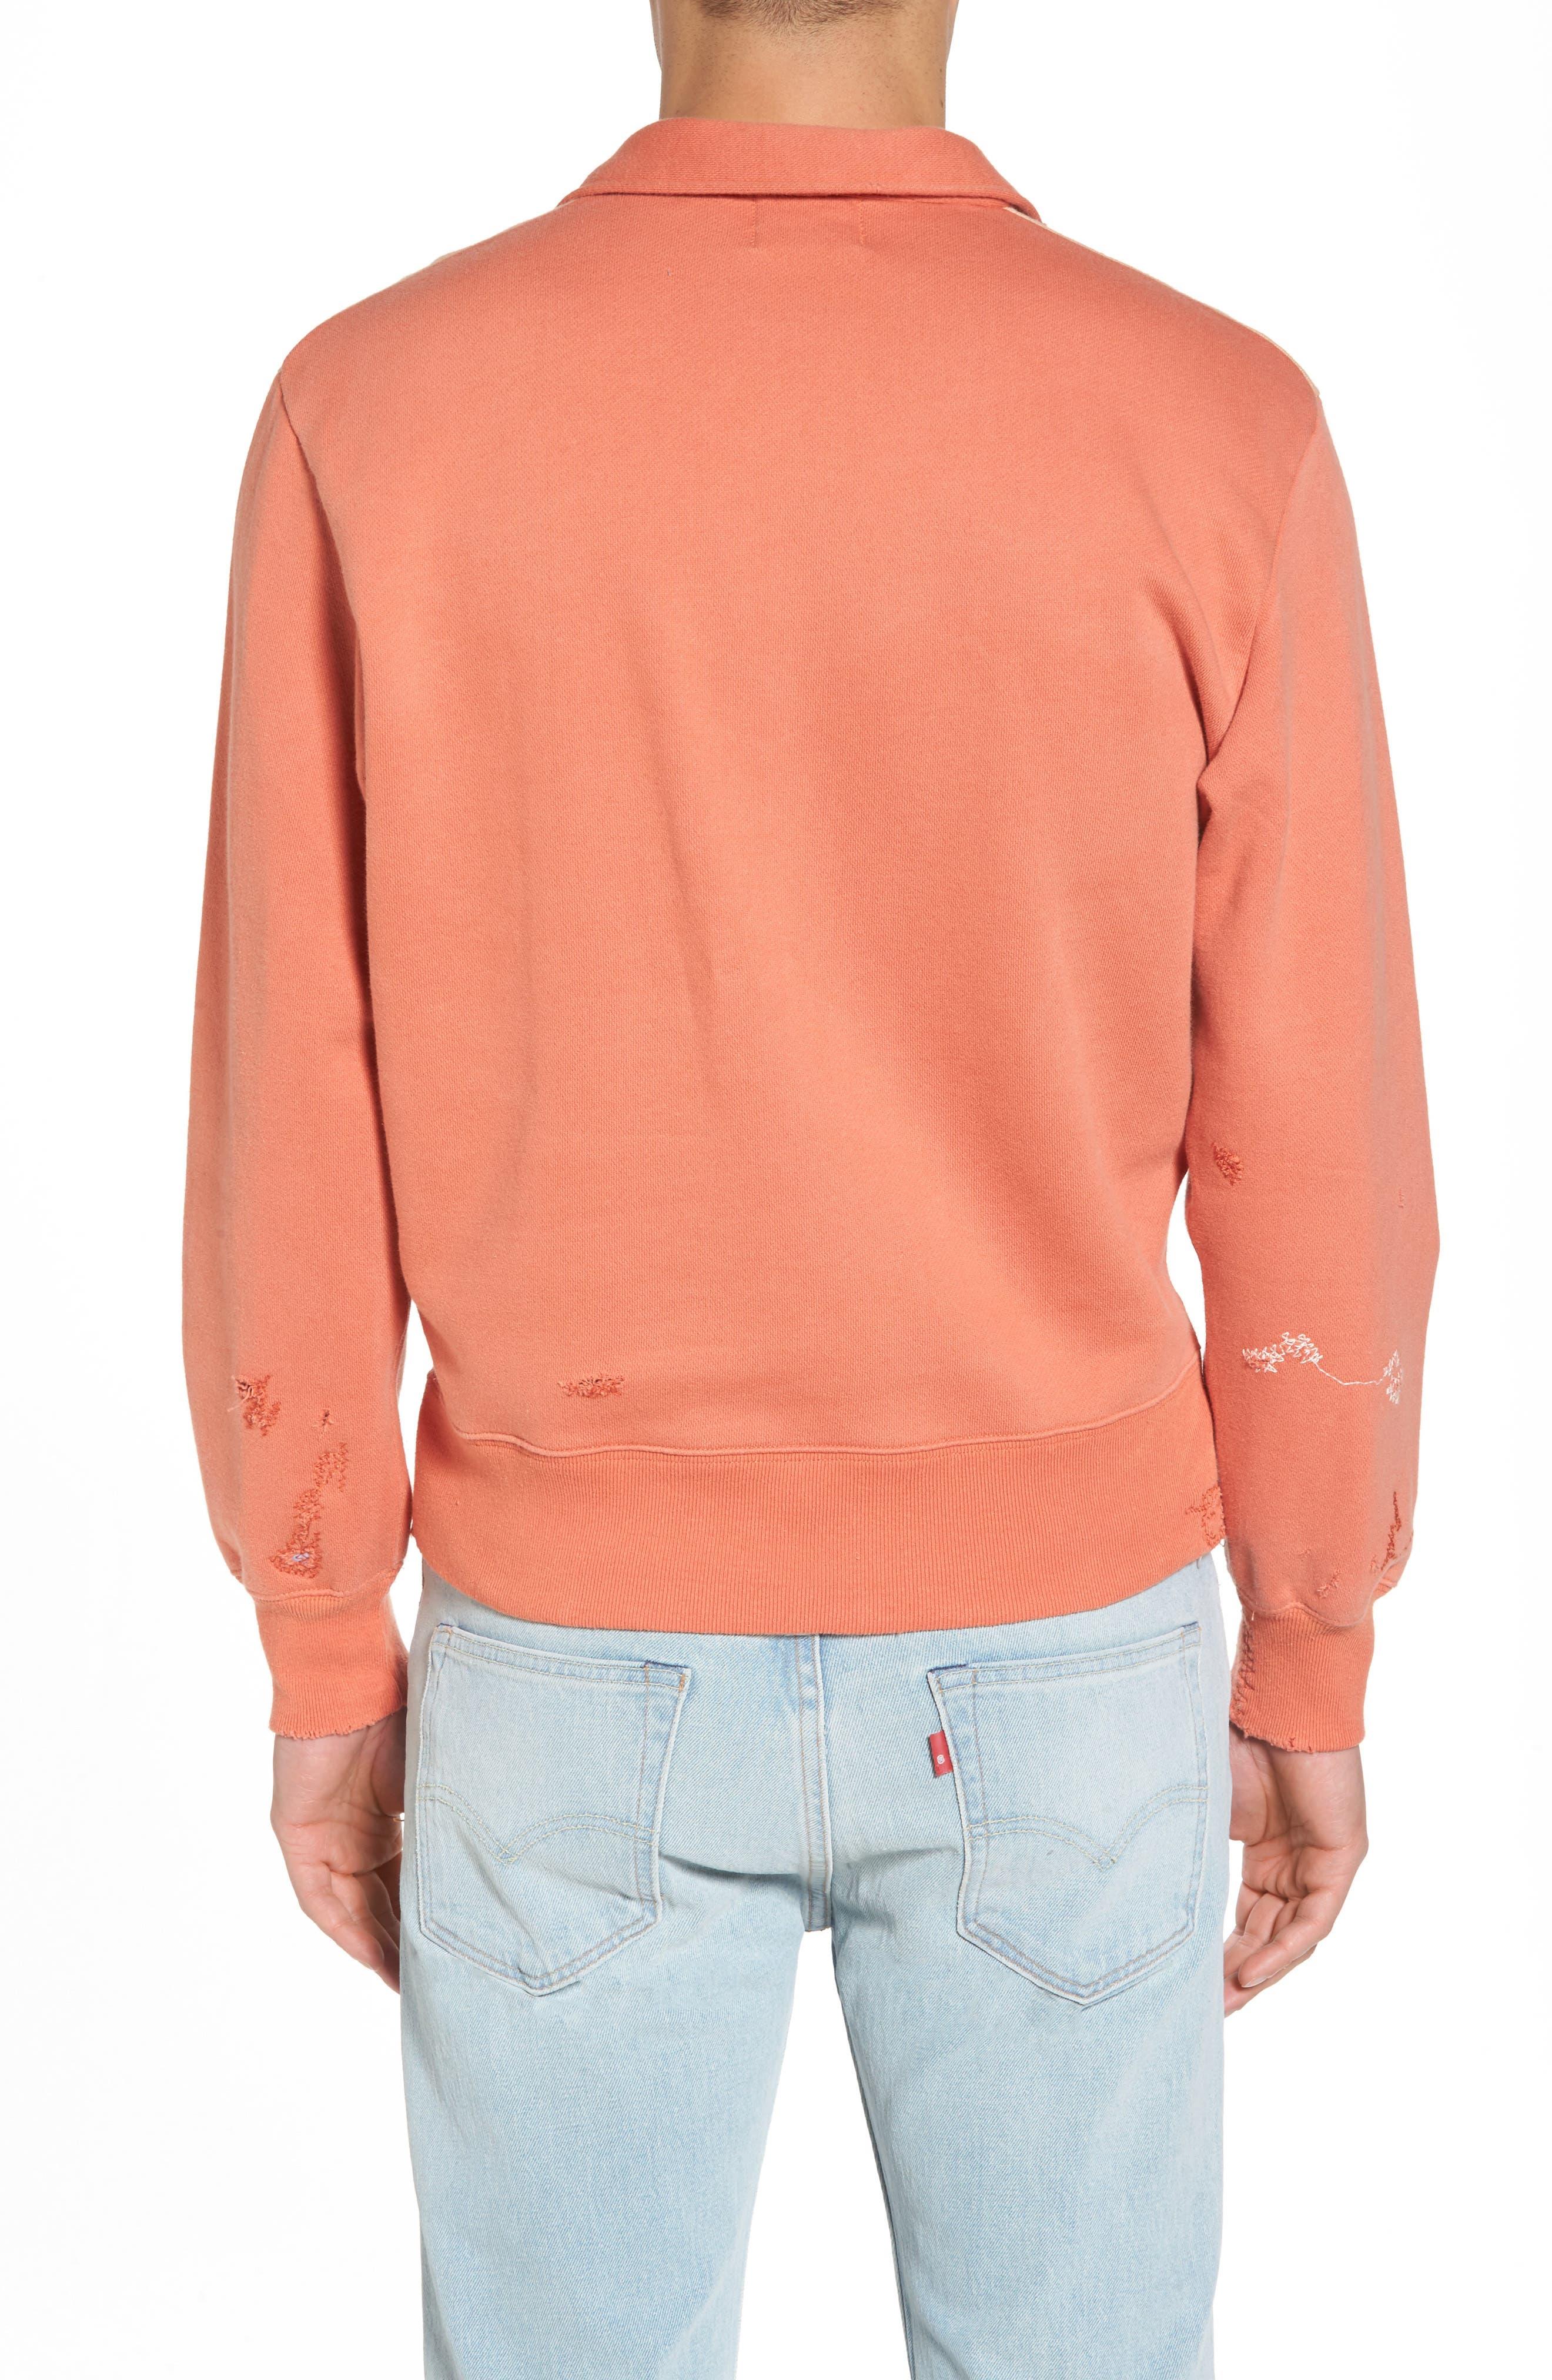 Alternate Image 2  - Levi's® Vintage Clothing Colorblocked Quarter Zip Pullover